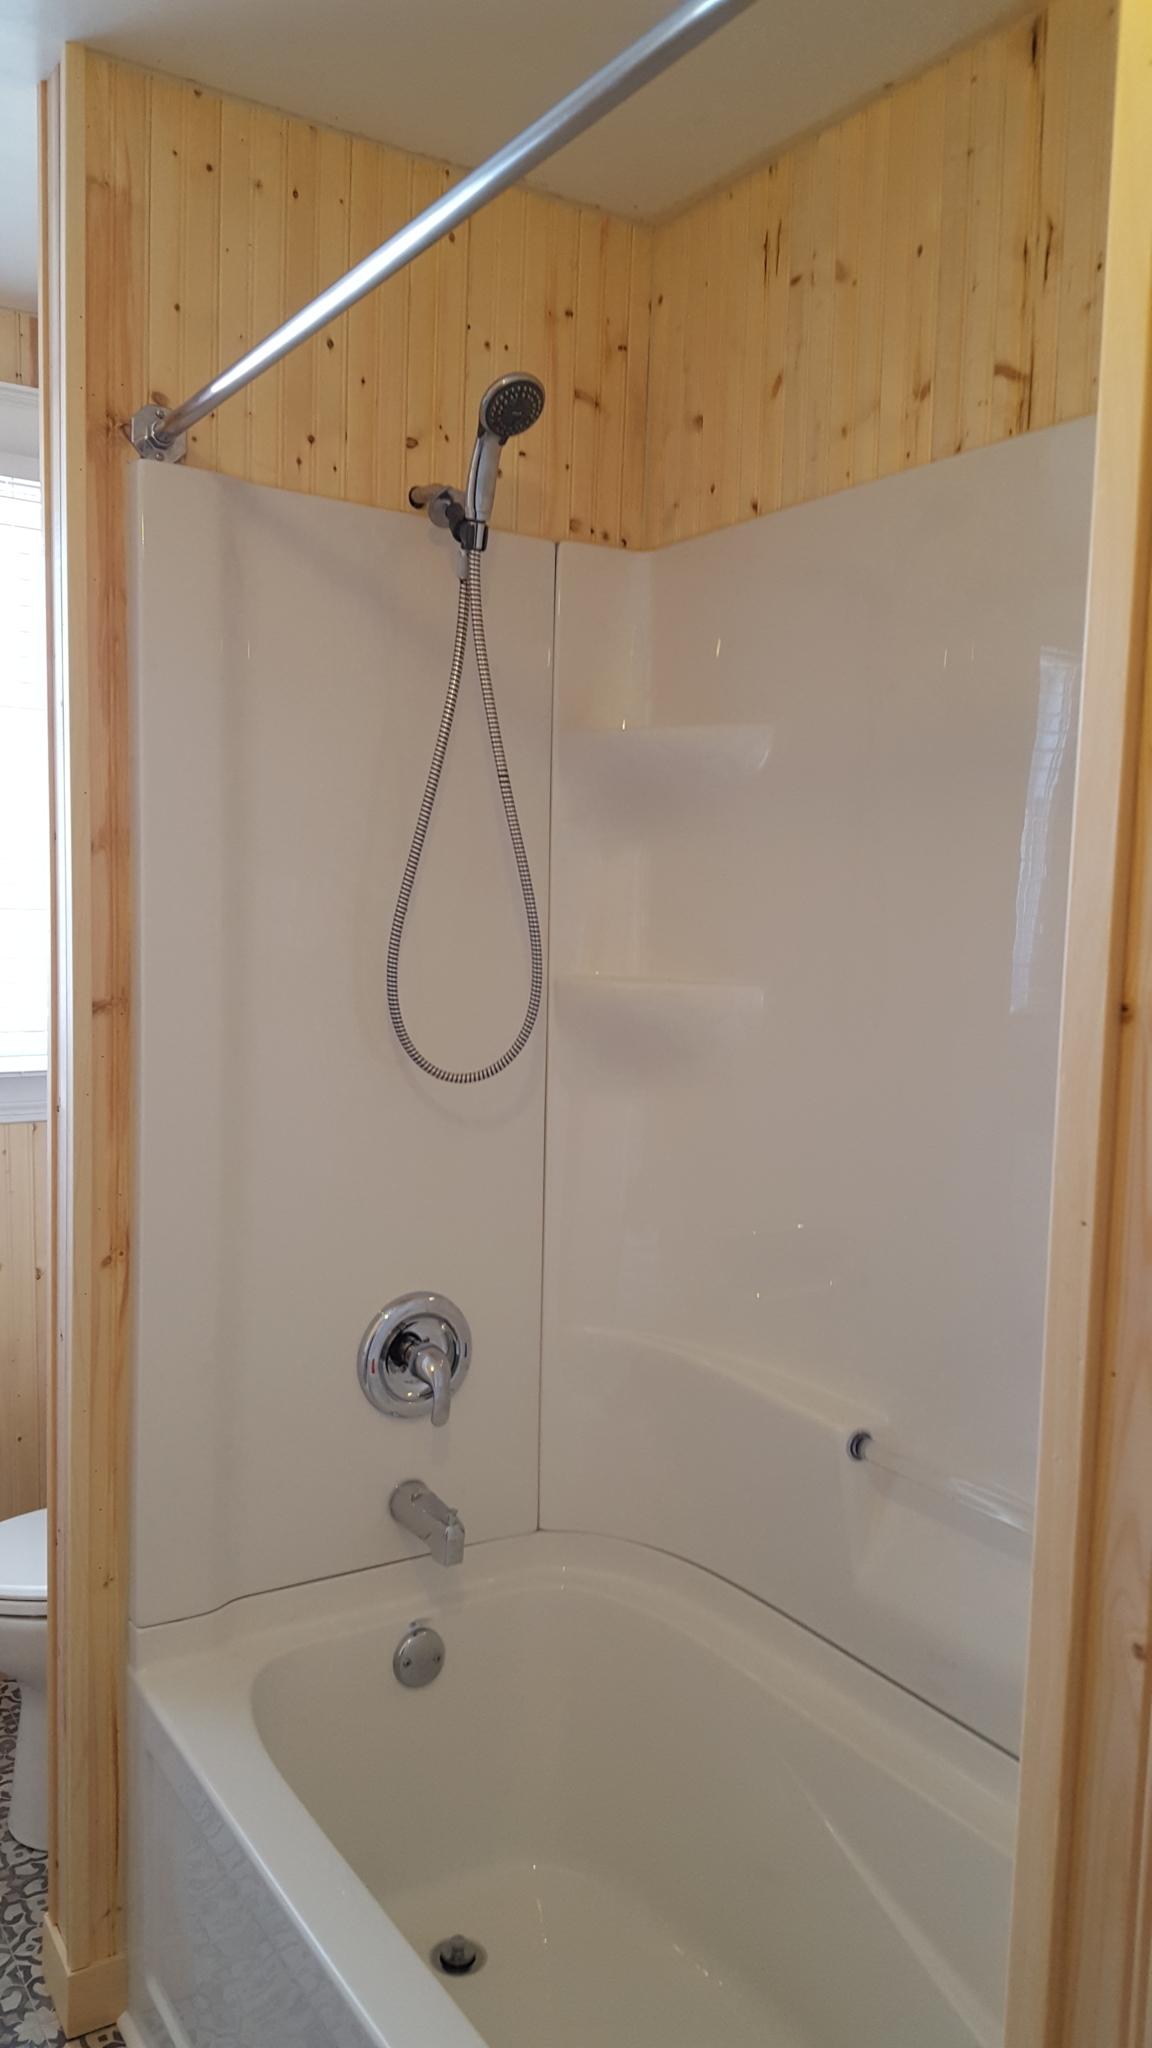 handyman wizard horaire d 39 ouverture 320 rte la vallee memramcook nb. Black Bedroom Furniture Sets. Home Design Ideas